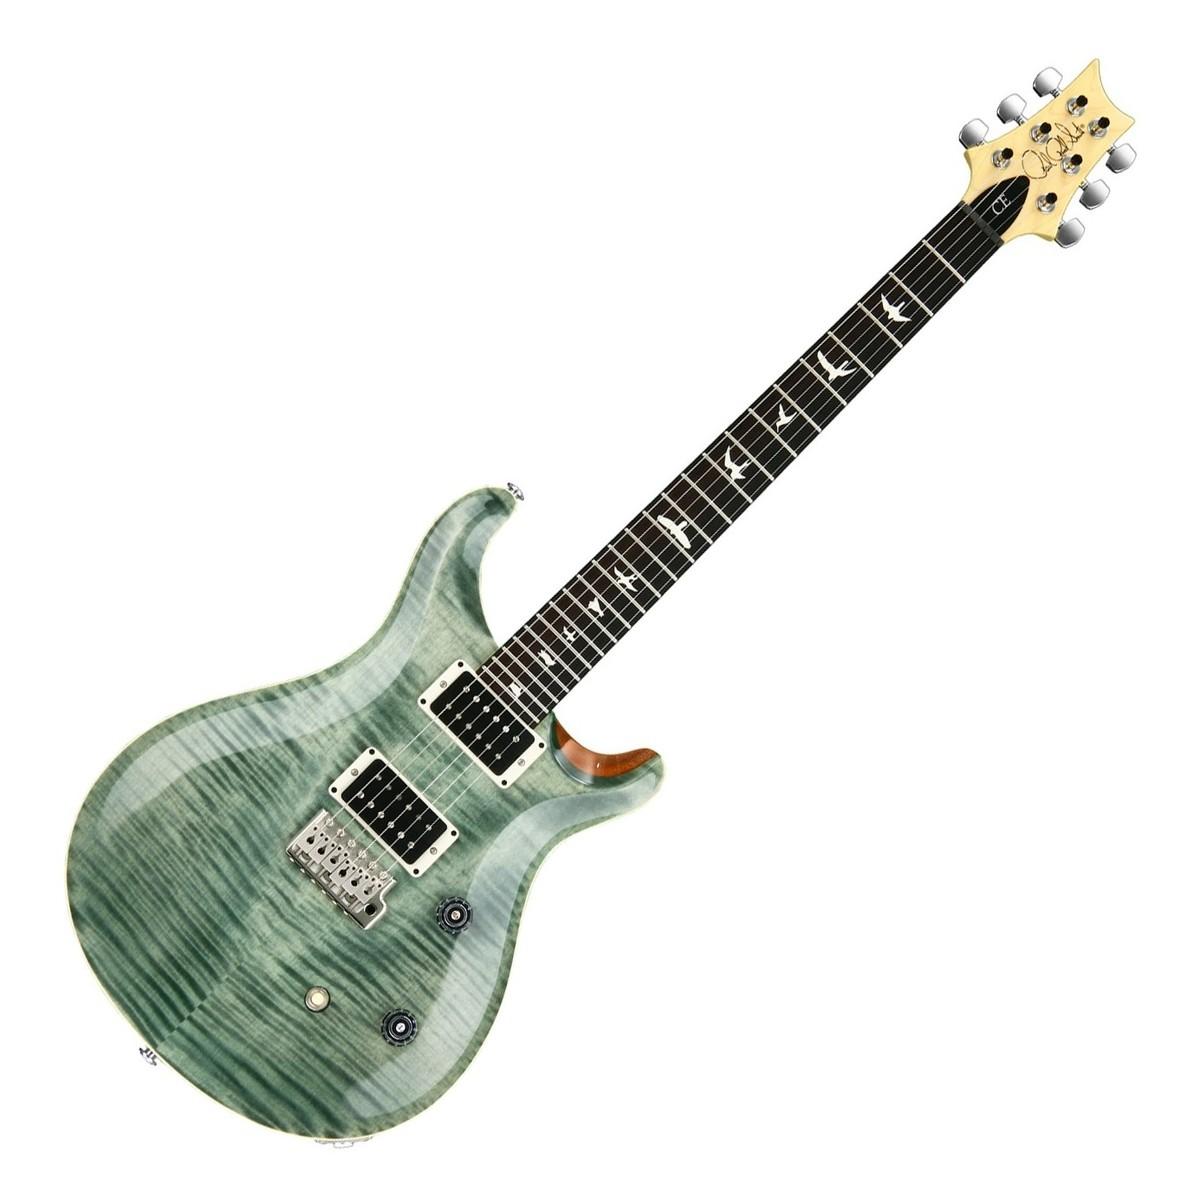 prs ce24 guitare lectrique trampas vert. Black Bedroom Furniture Sets. Home Design Ideas